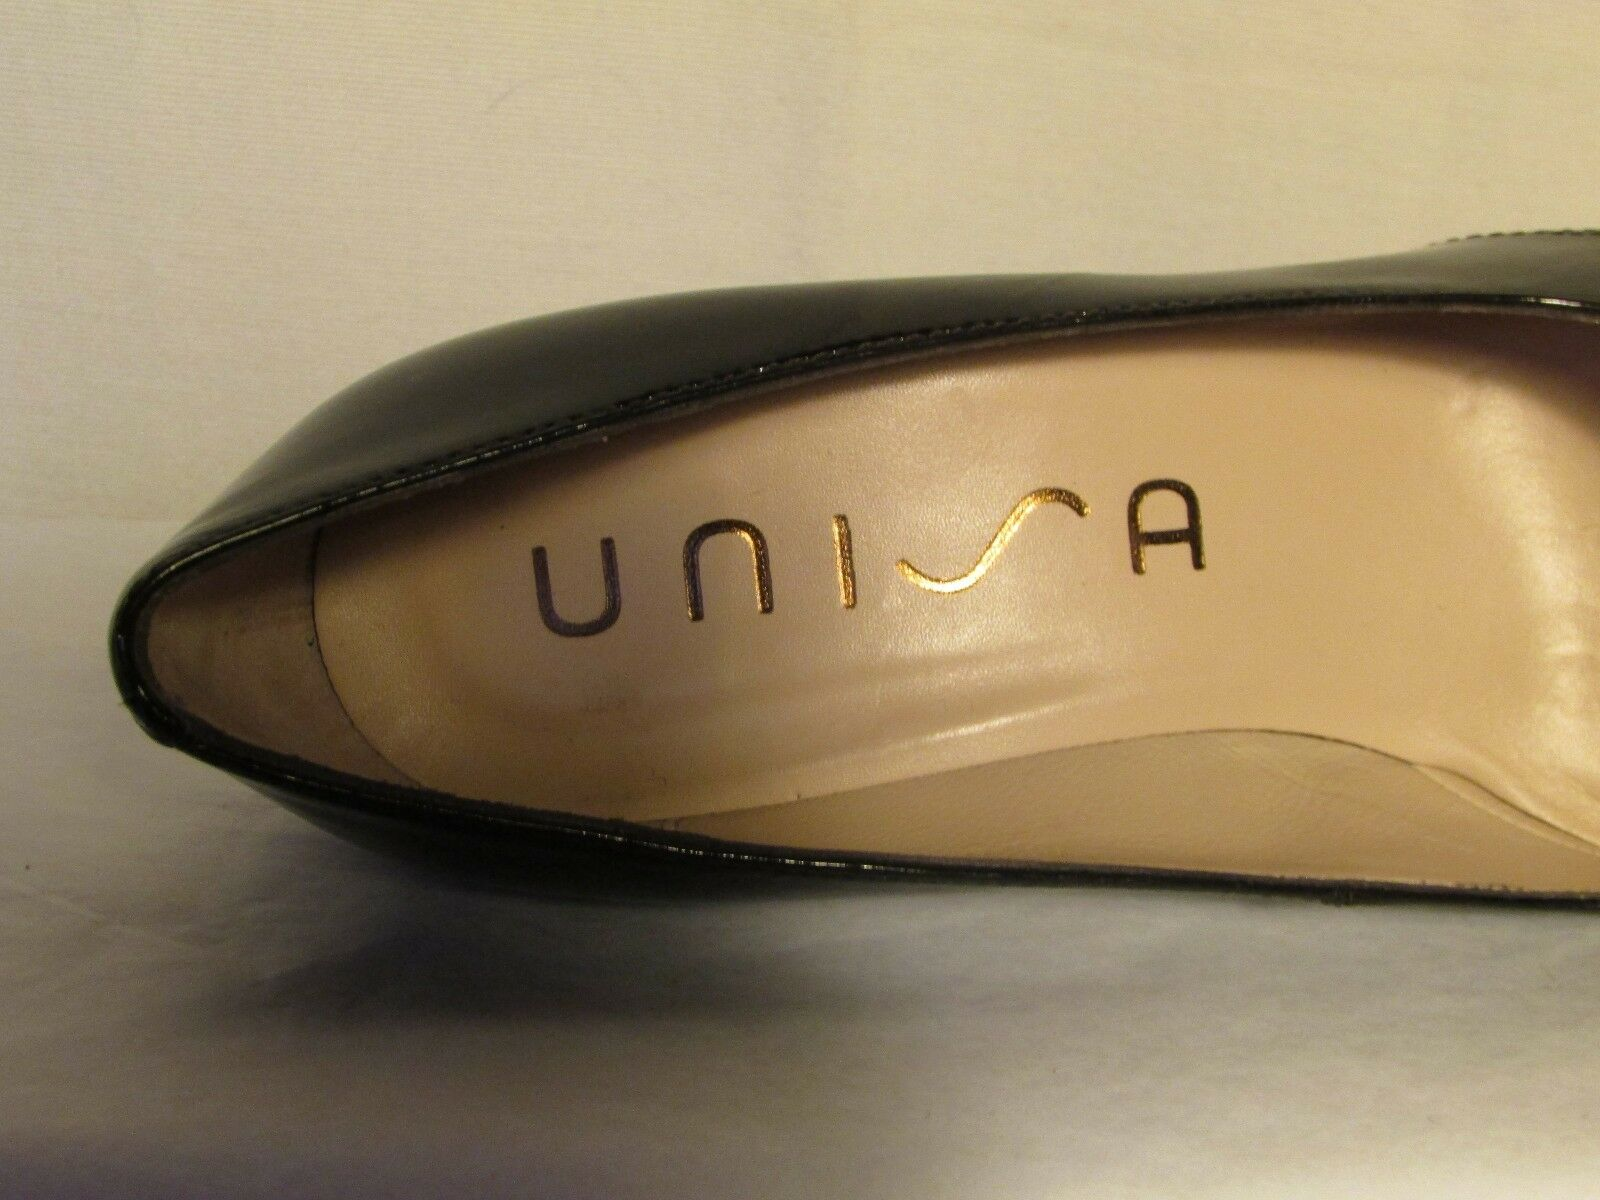 Escarpins verni UNISA cuir verni Escarpins chocolat à reflets 38 cf86ae